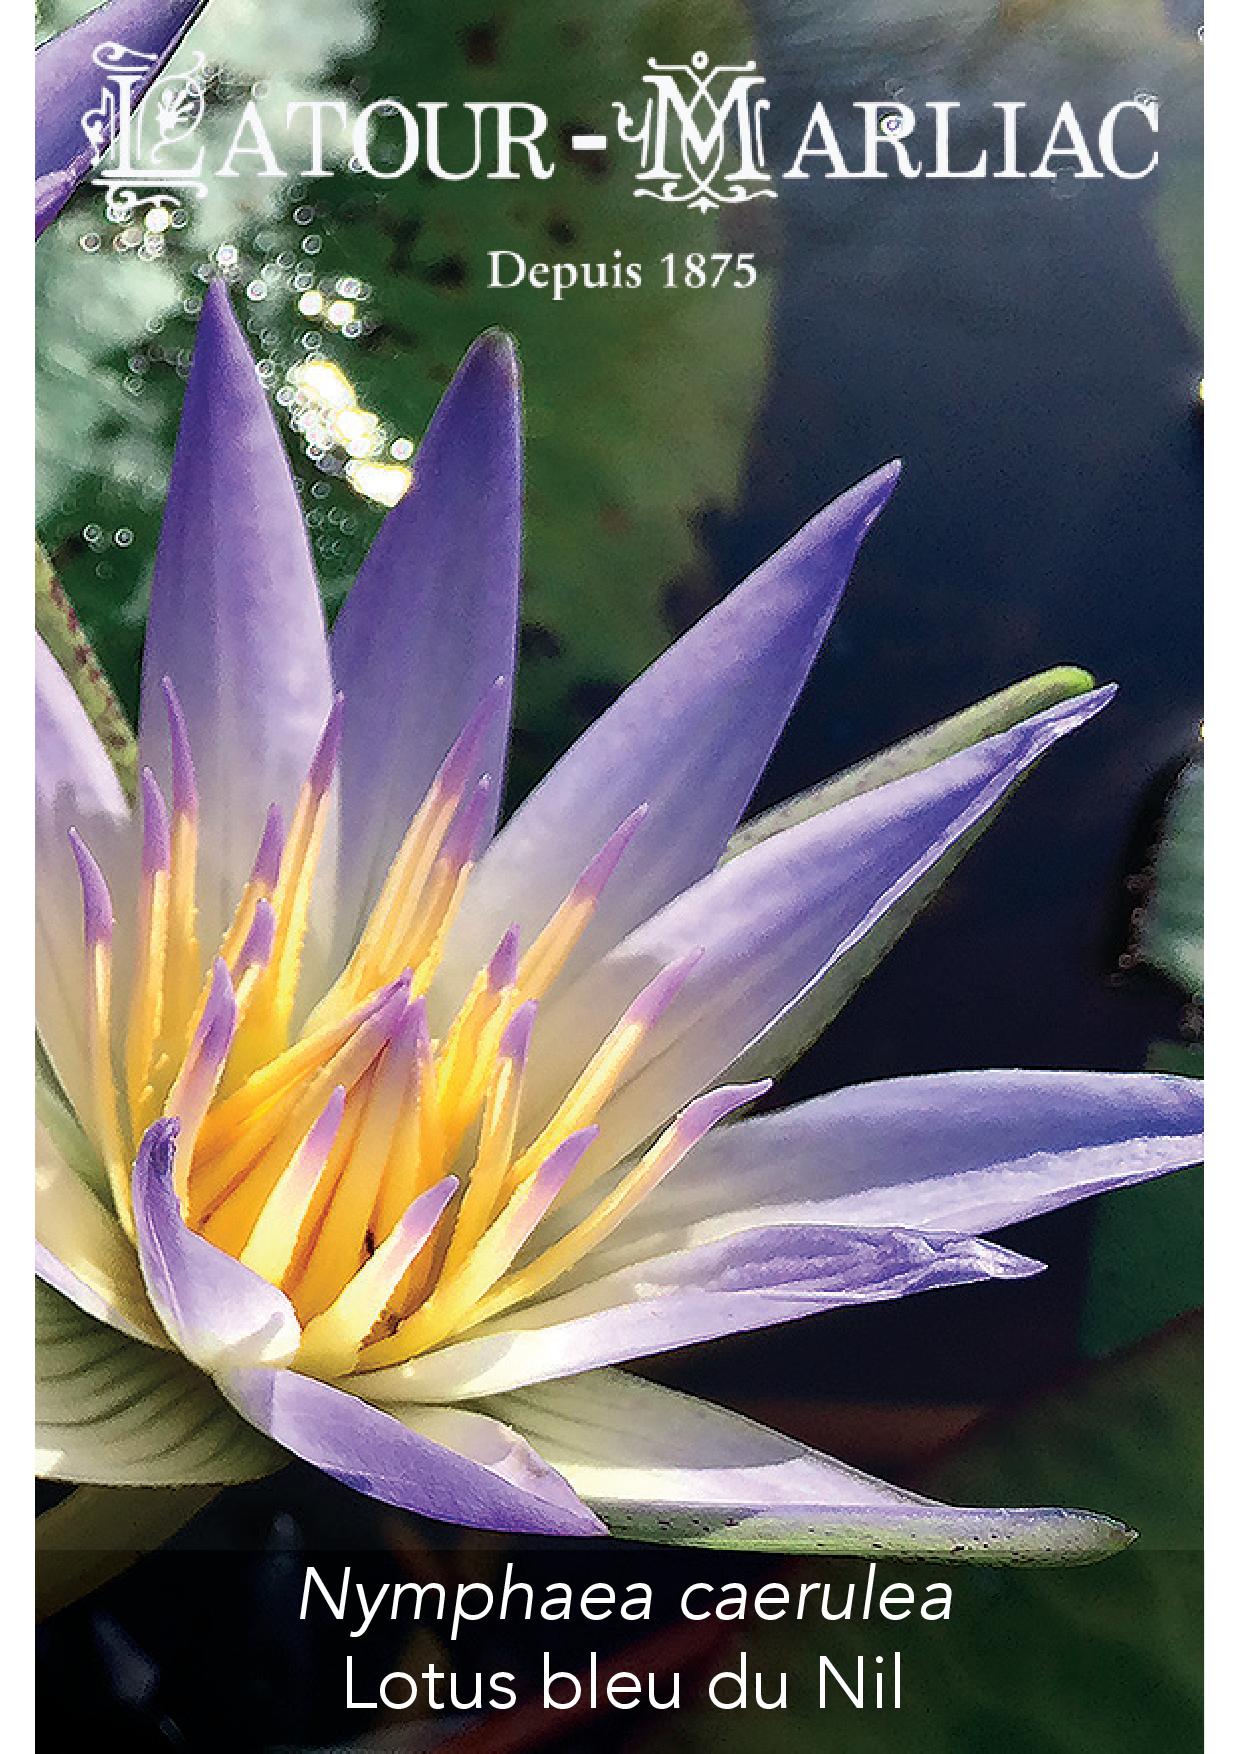 Nymphaea Caerulea bleus Nénuphar bleu LOTUS DU NIL 50 graines